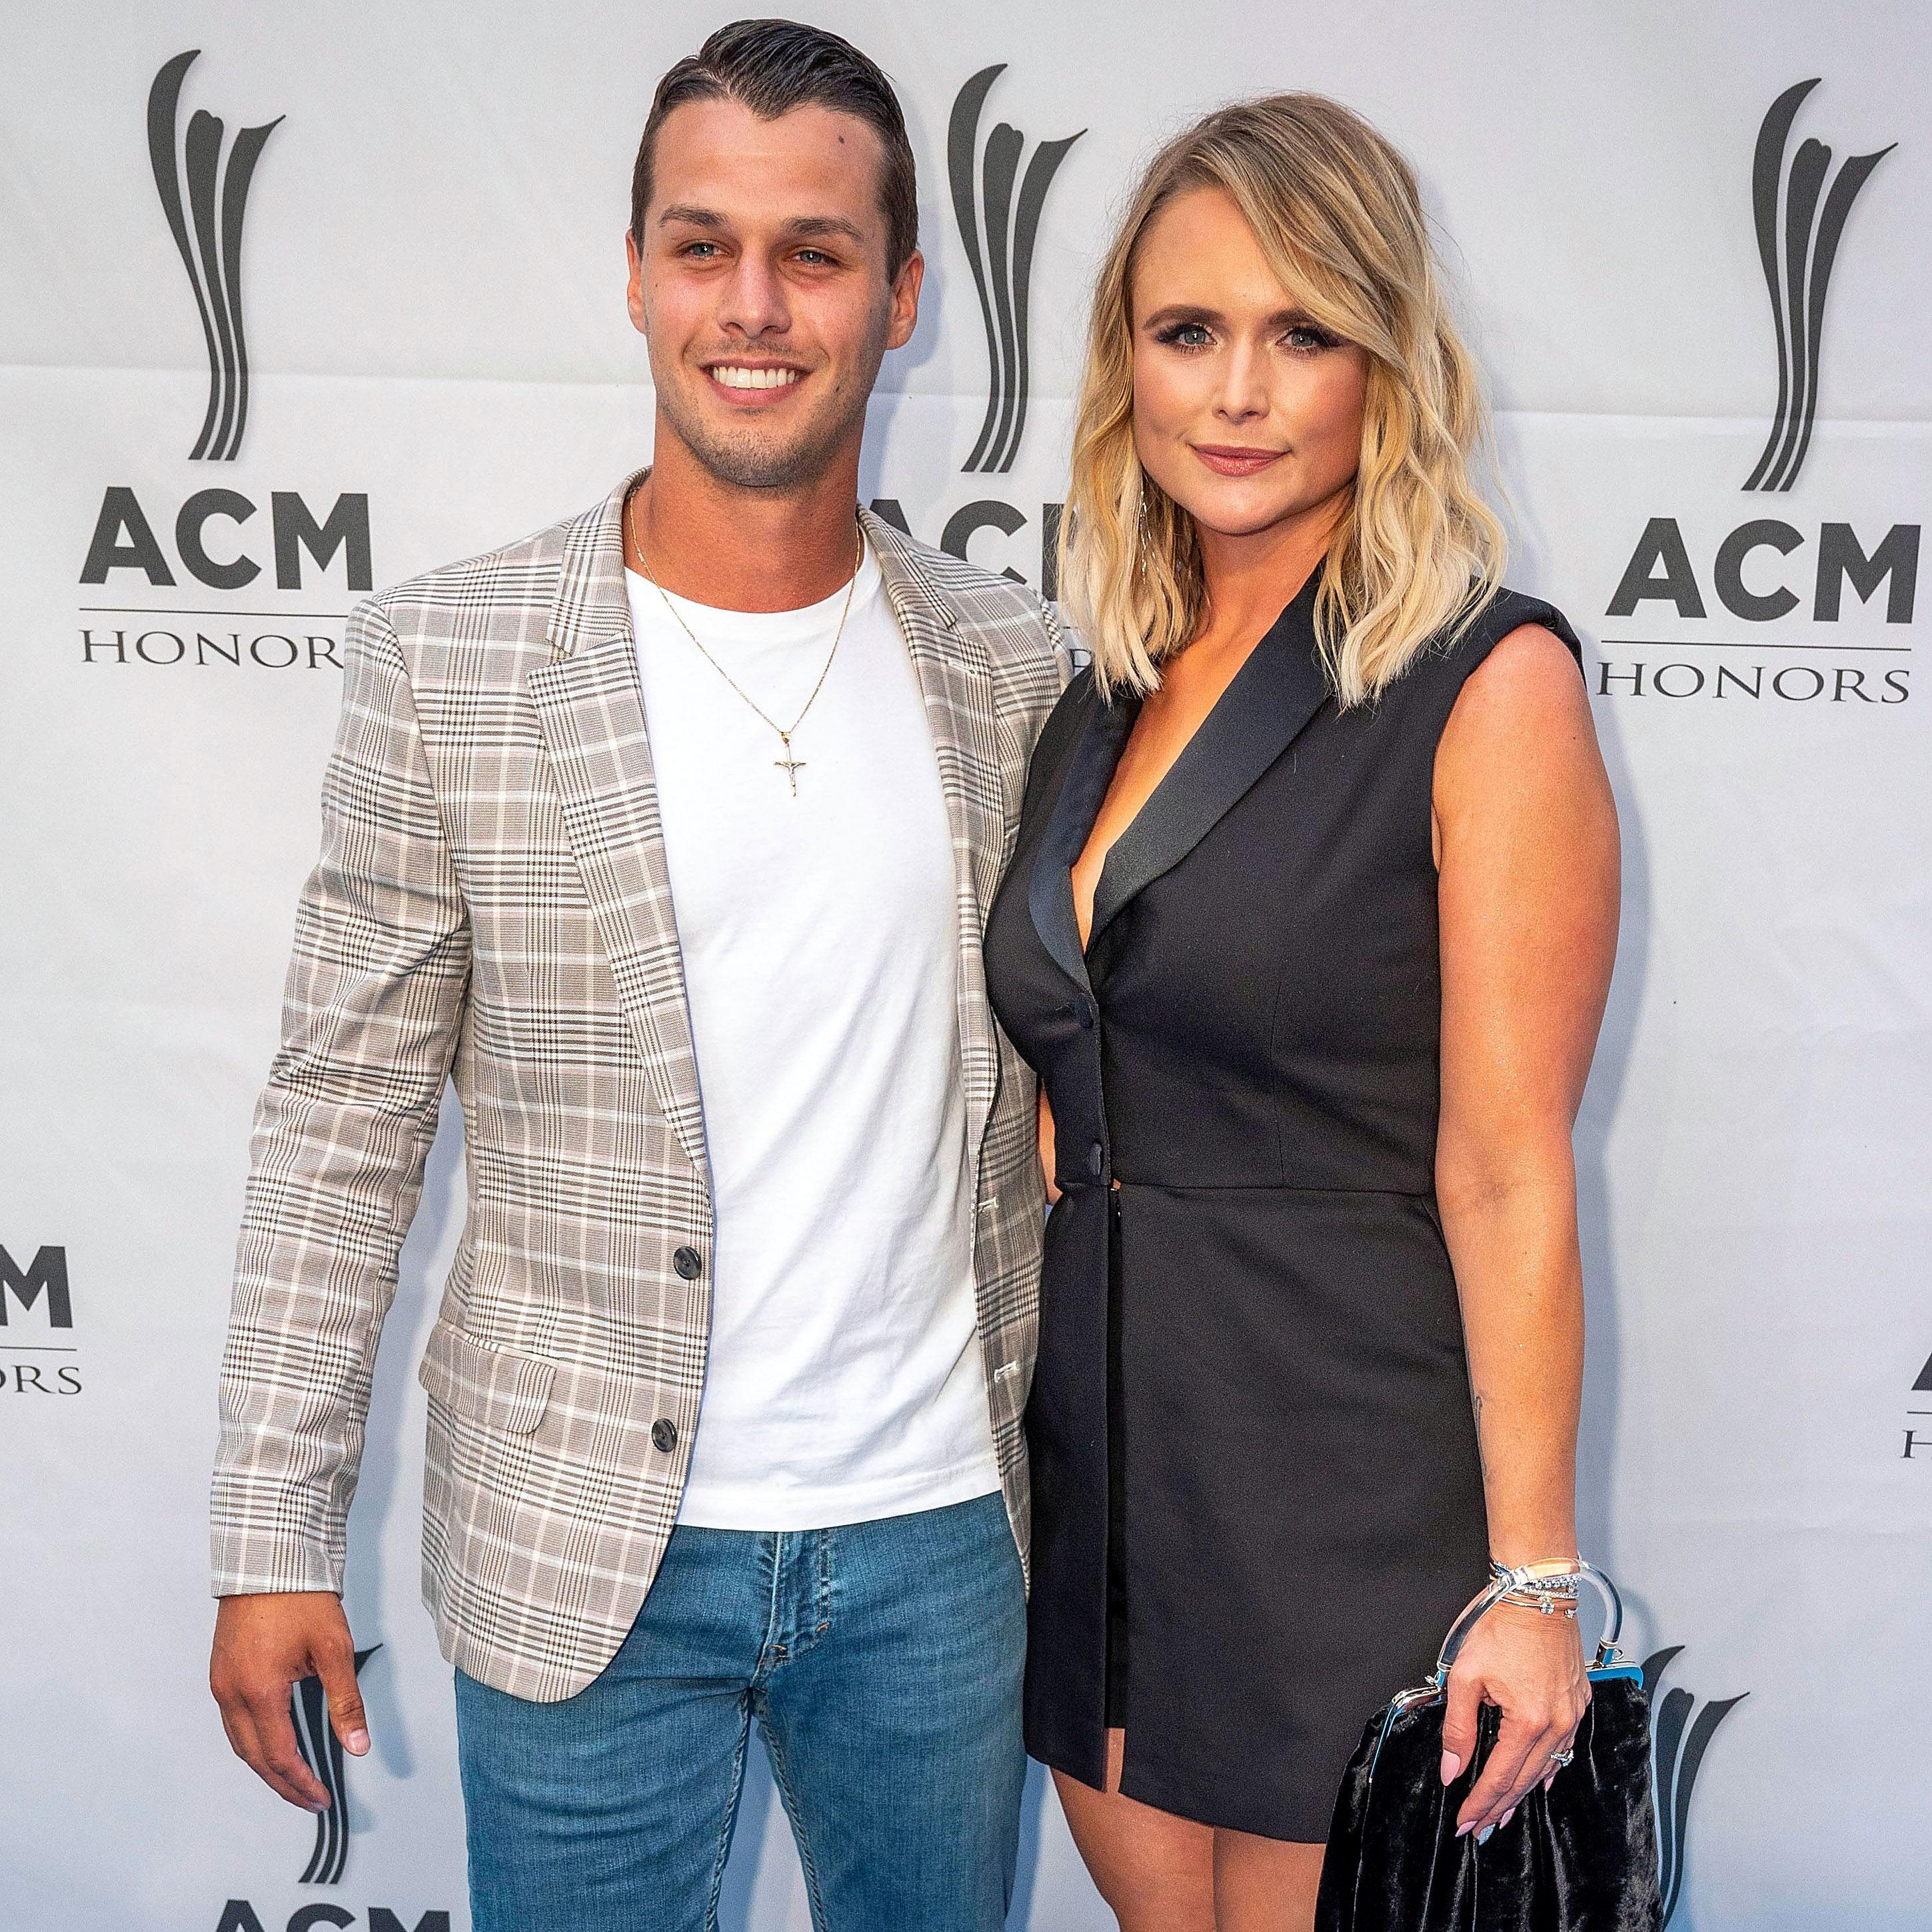 Miranda Lambert Gives 'Sweet Husband' Brendan a Shout-Out at Concert